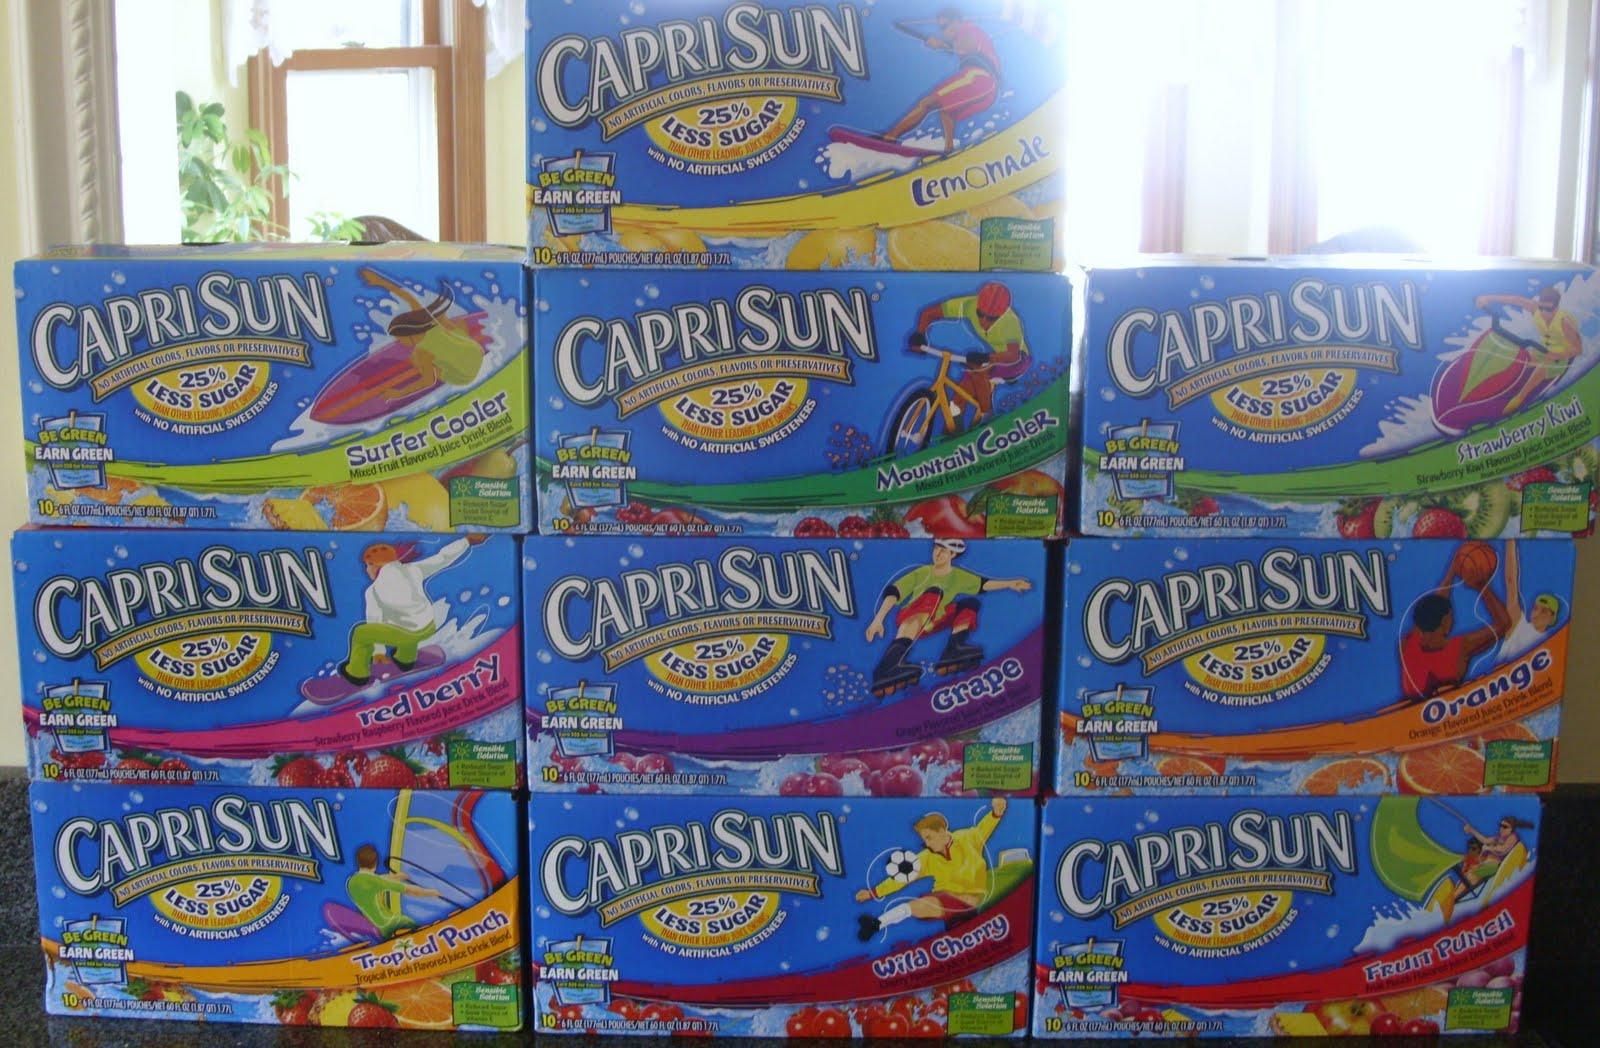 Capri sun coupons sep 2018